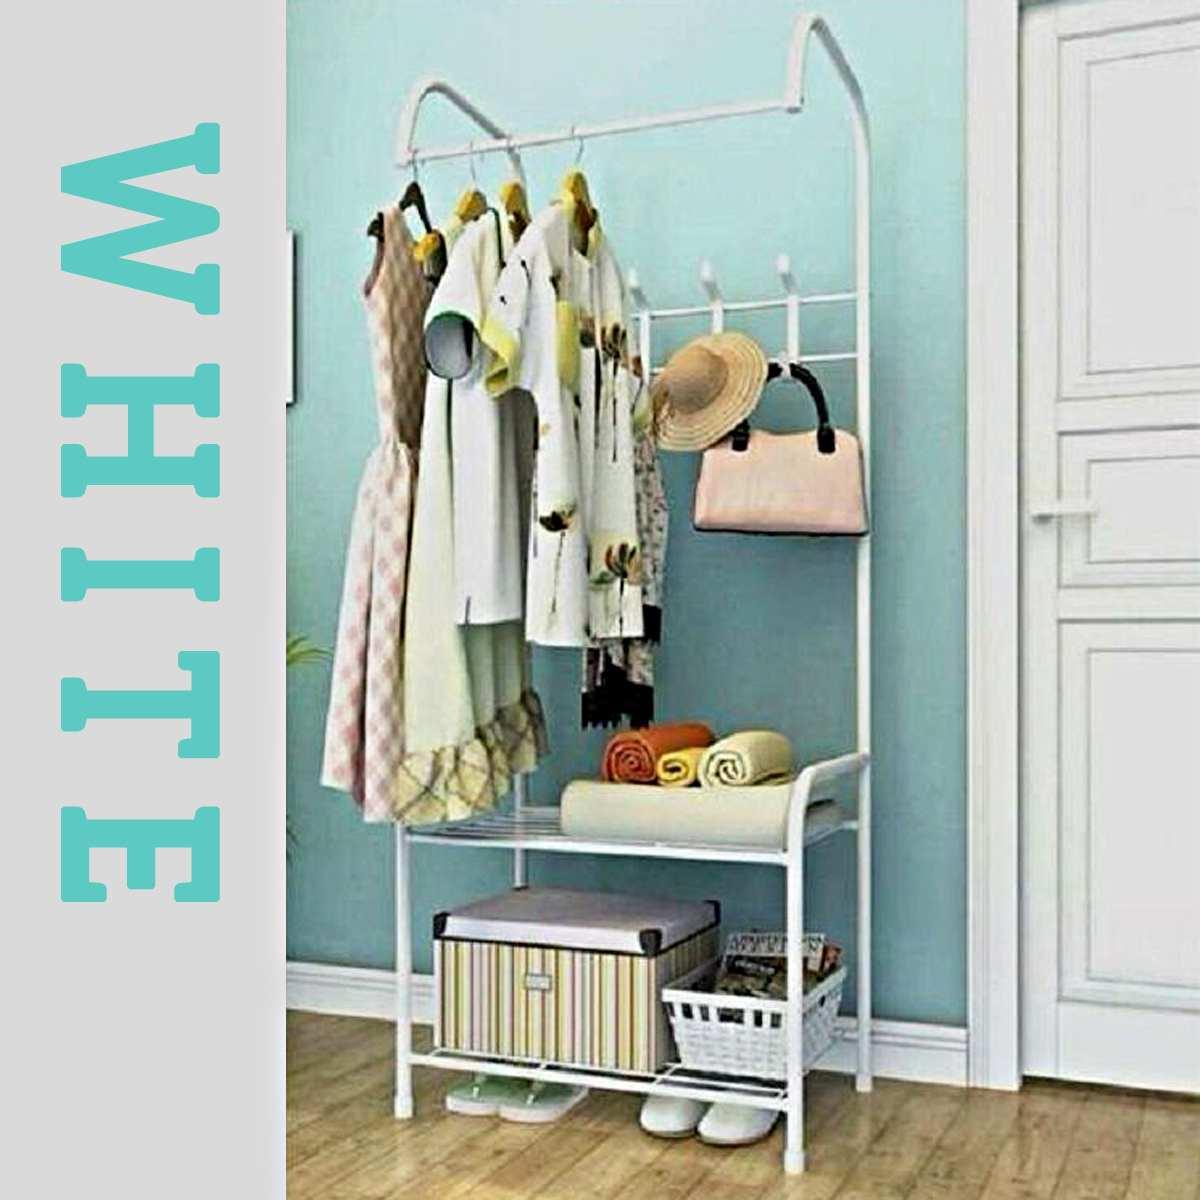 Colorful Simple Style Landing Clothing Holder Hanger Coat Rack Floor Standing Storage Shelf Clothe Hanger Rack Bedroom Furniture